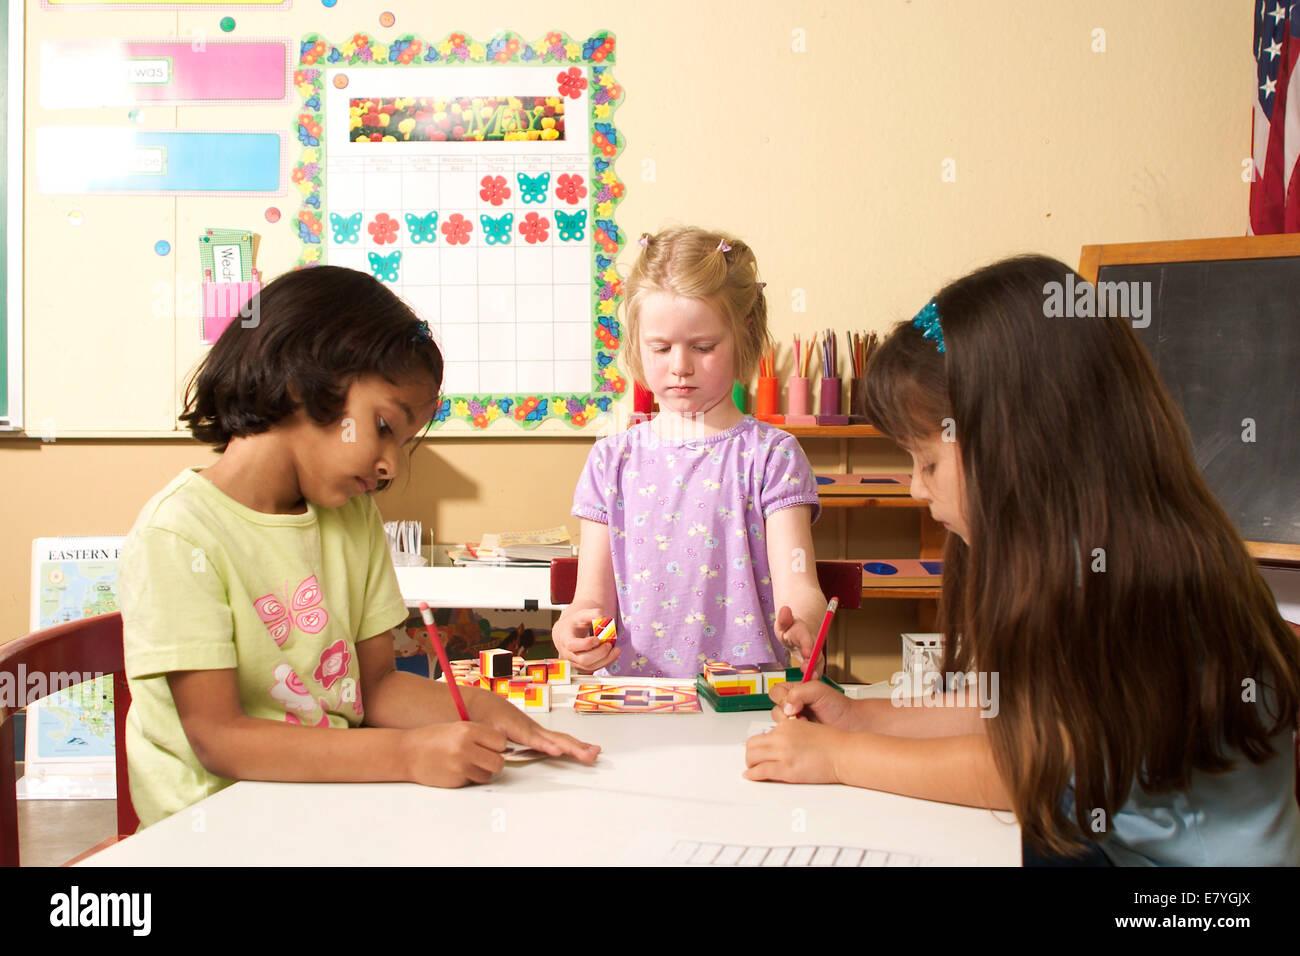 Kindergarten School Table Stock Photos Amp Kindergarten School Table Stock Images